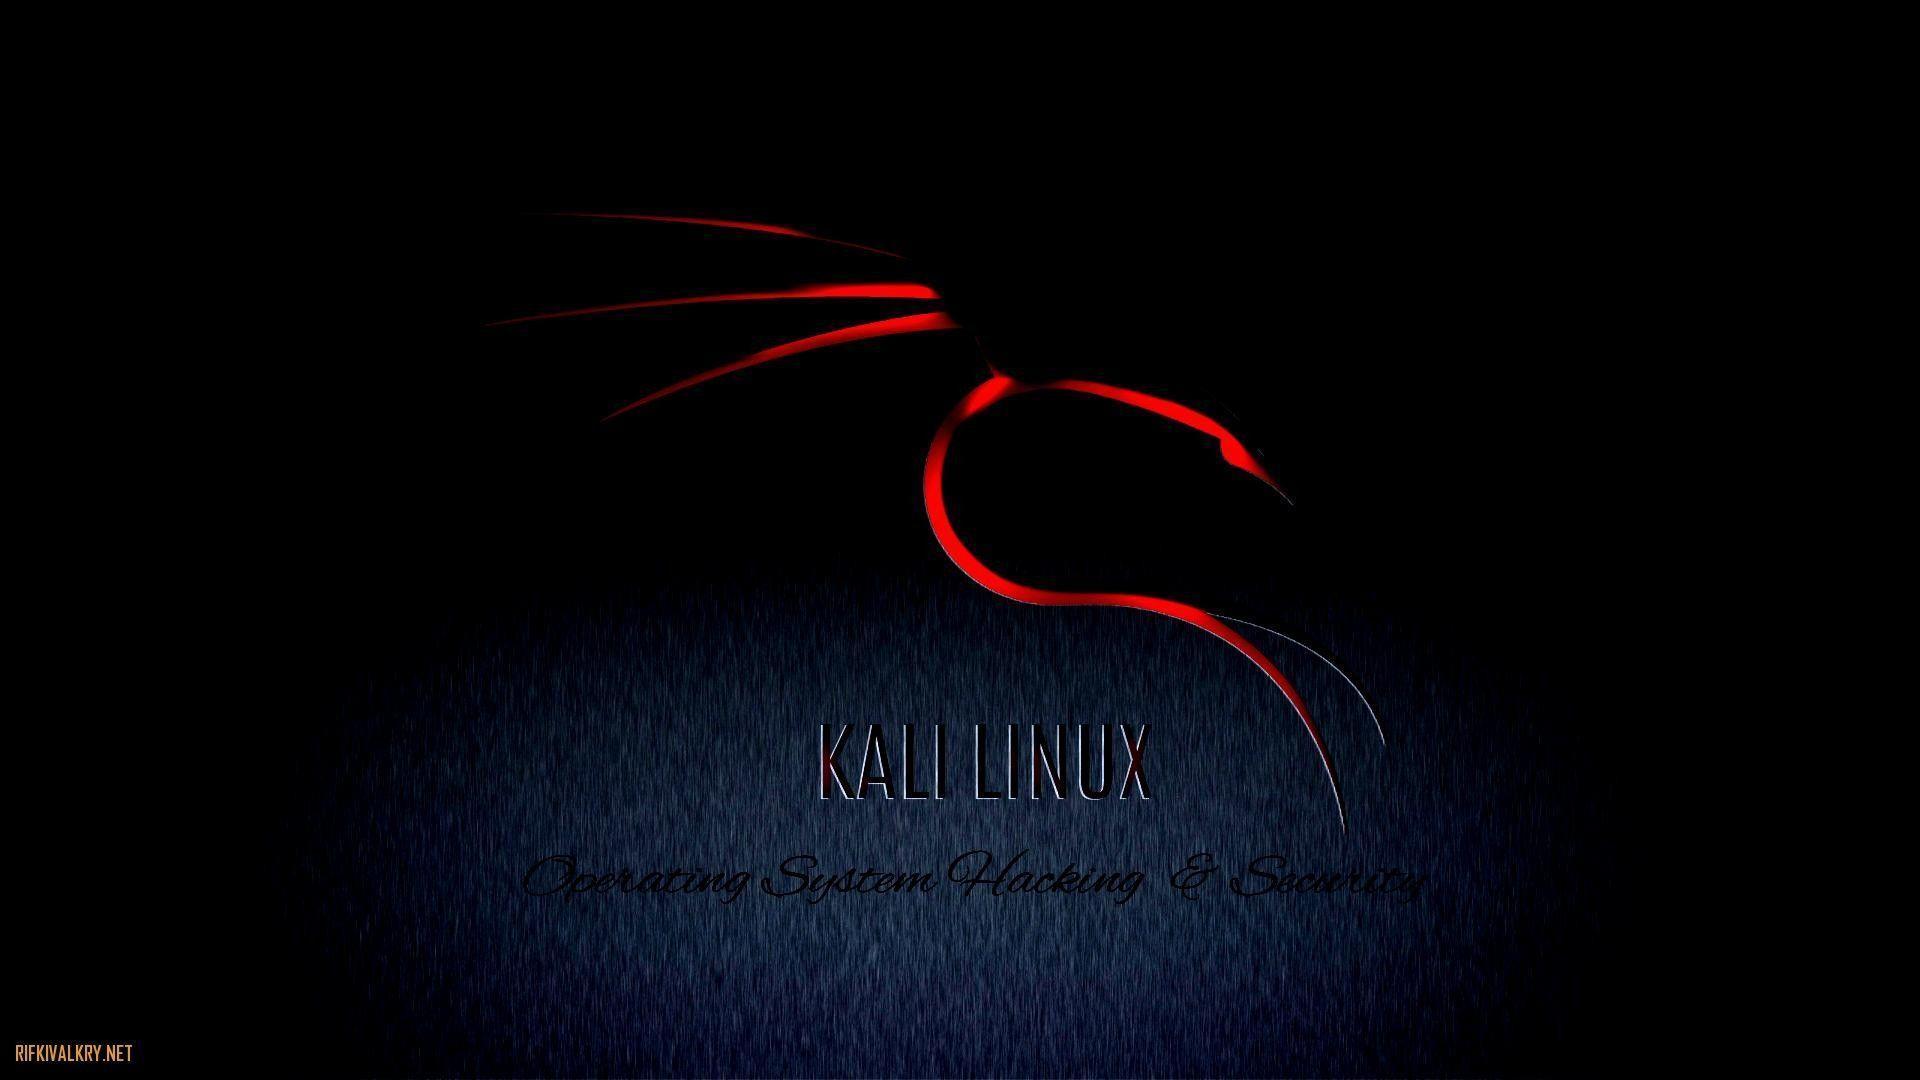 Kali Linux 4k Wallpapers Top Free Kali Linux 4k Backgrounds Wallpaperaccess